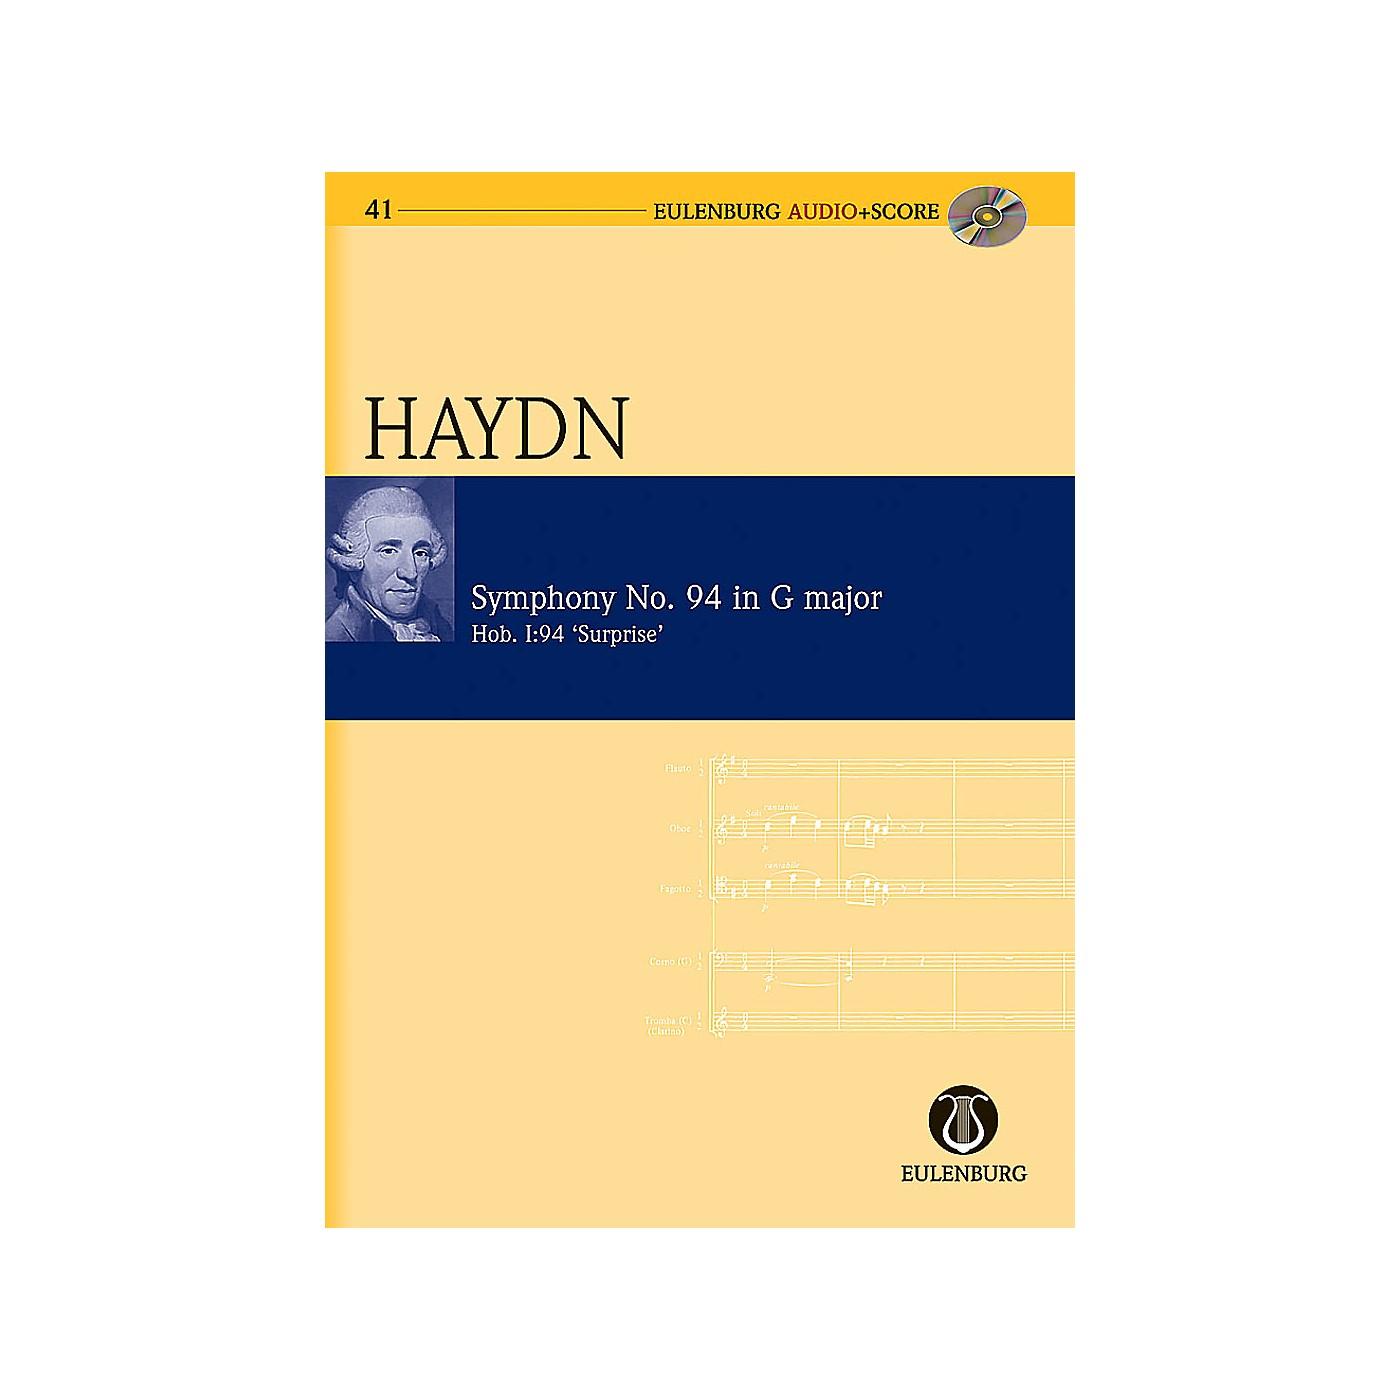 Eulenburg Symphony No. 94 in G Major (Surprise Symphony) Hob. I:94 London No. 3 Eulenberg Audio plus Score by Haydn thumbnail